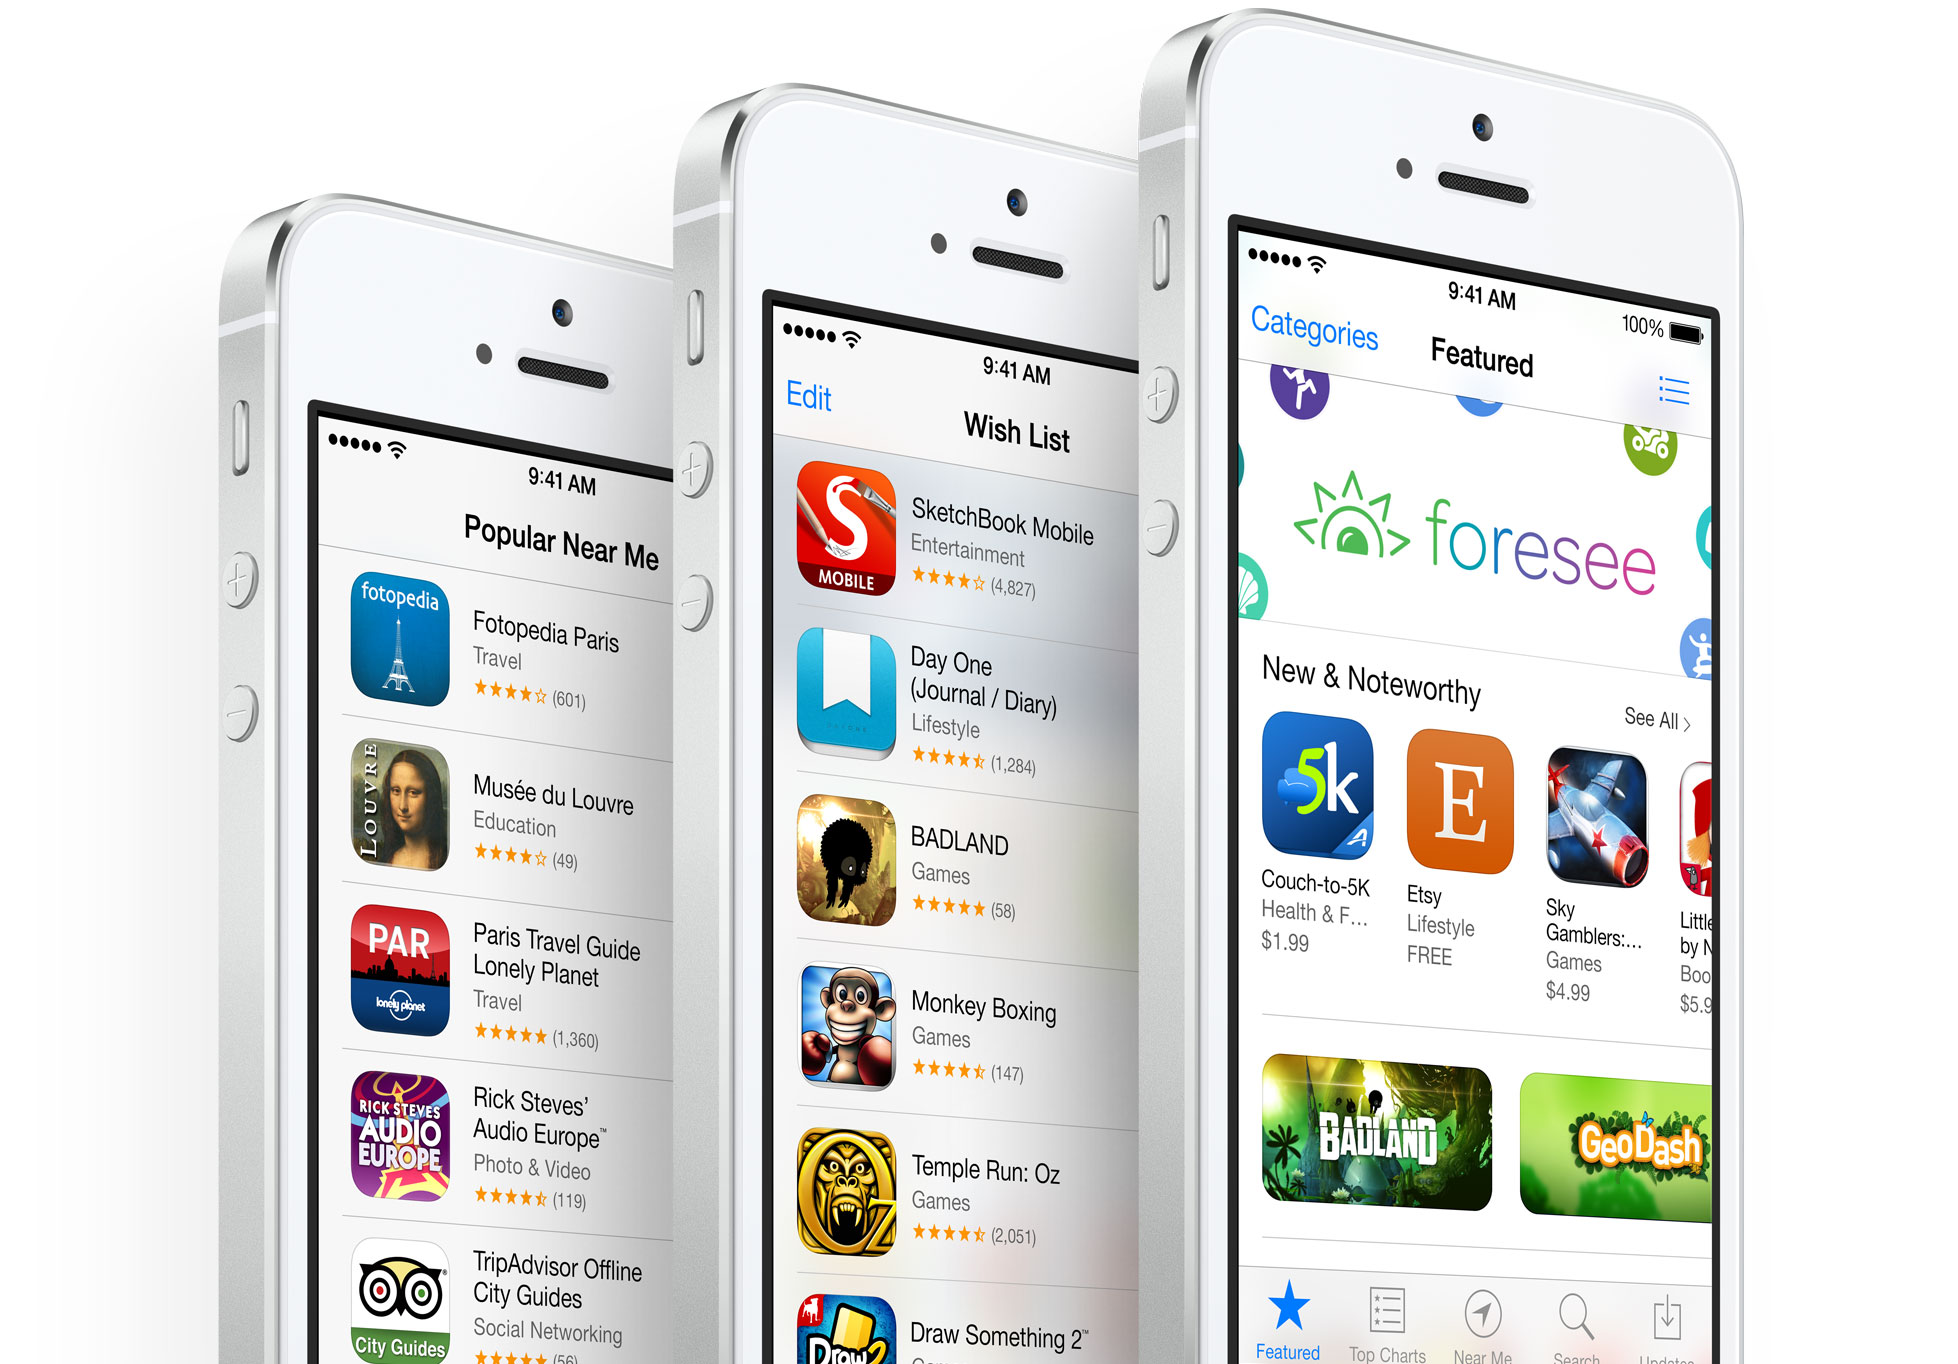 iphone-5s-ekran